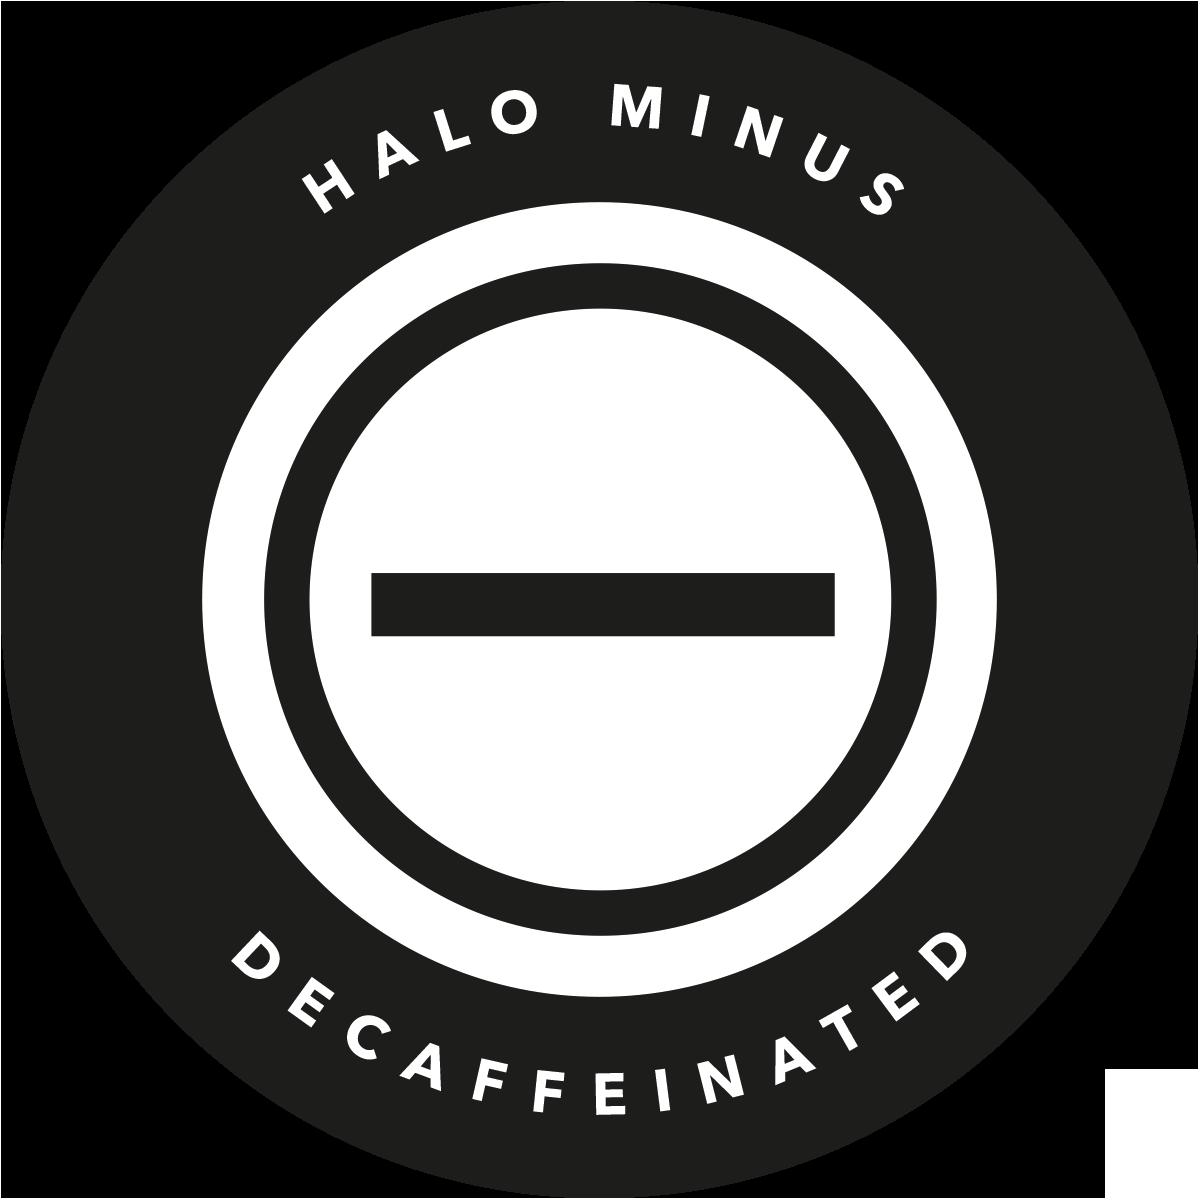 Halo-coffees-logo-Halo_minus.png